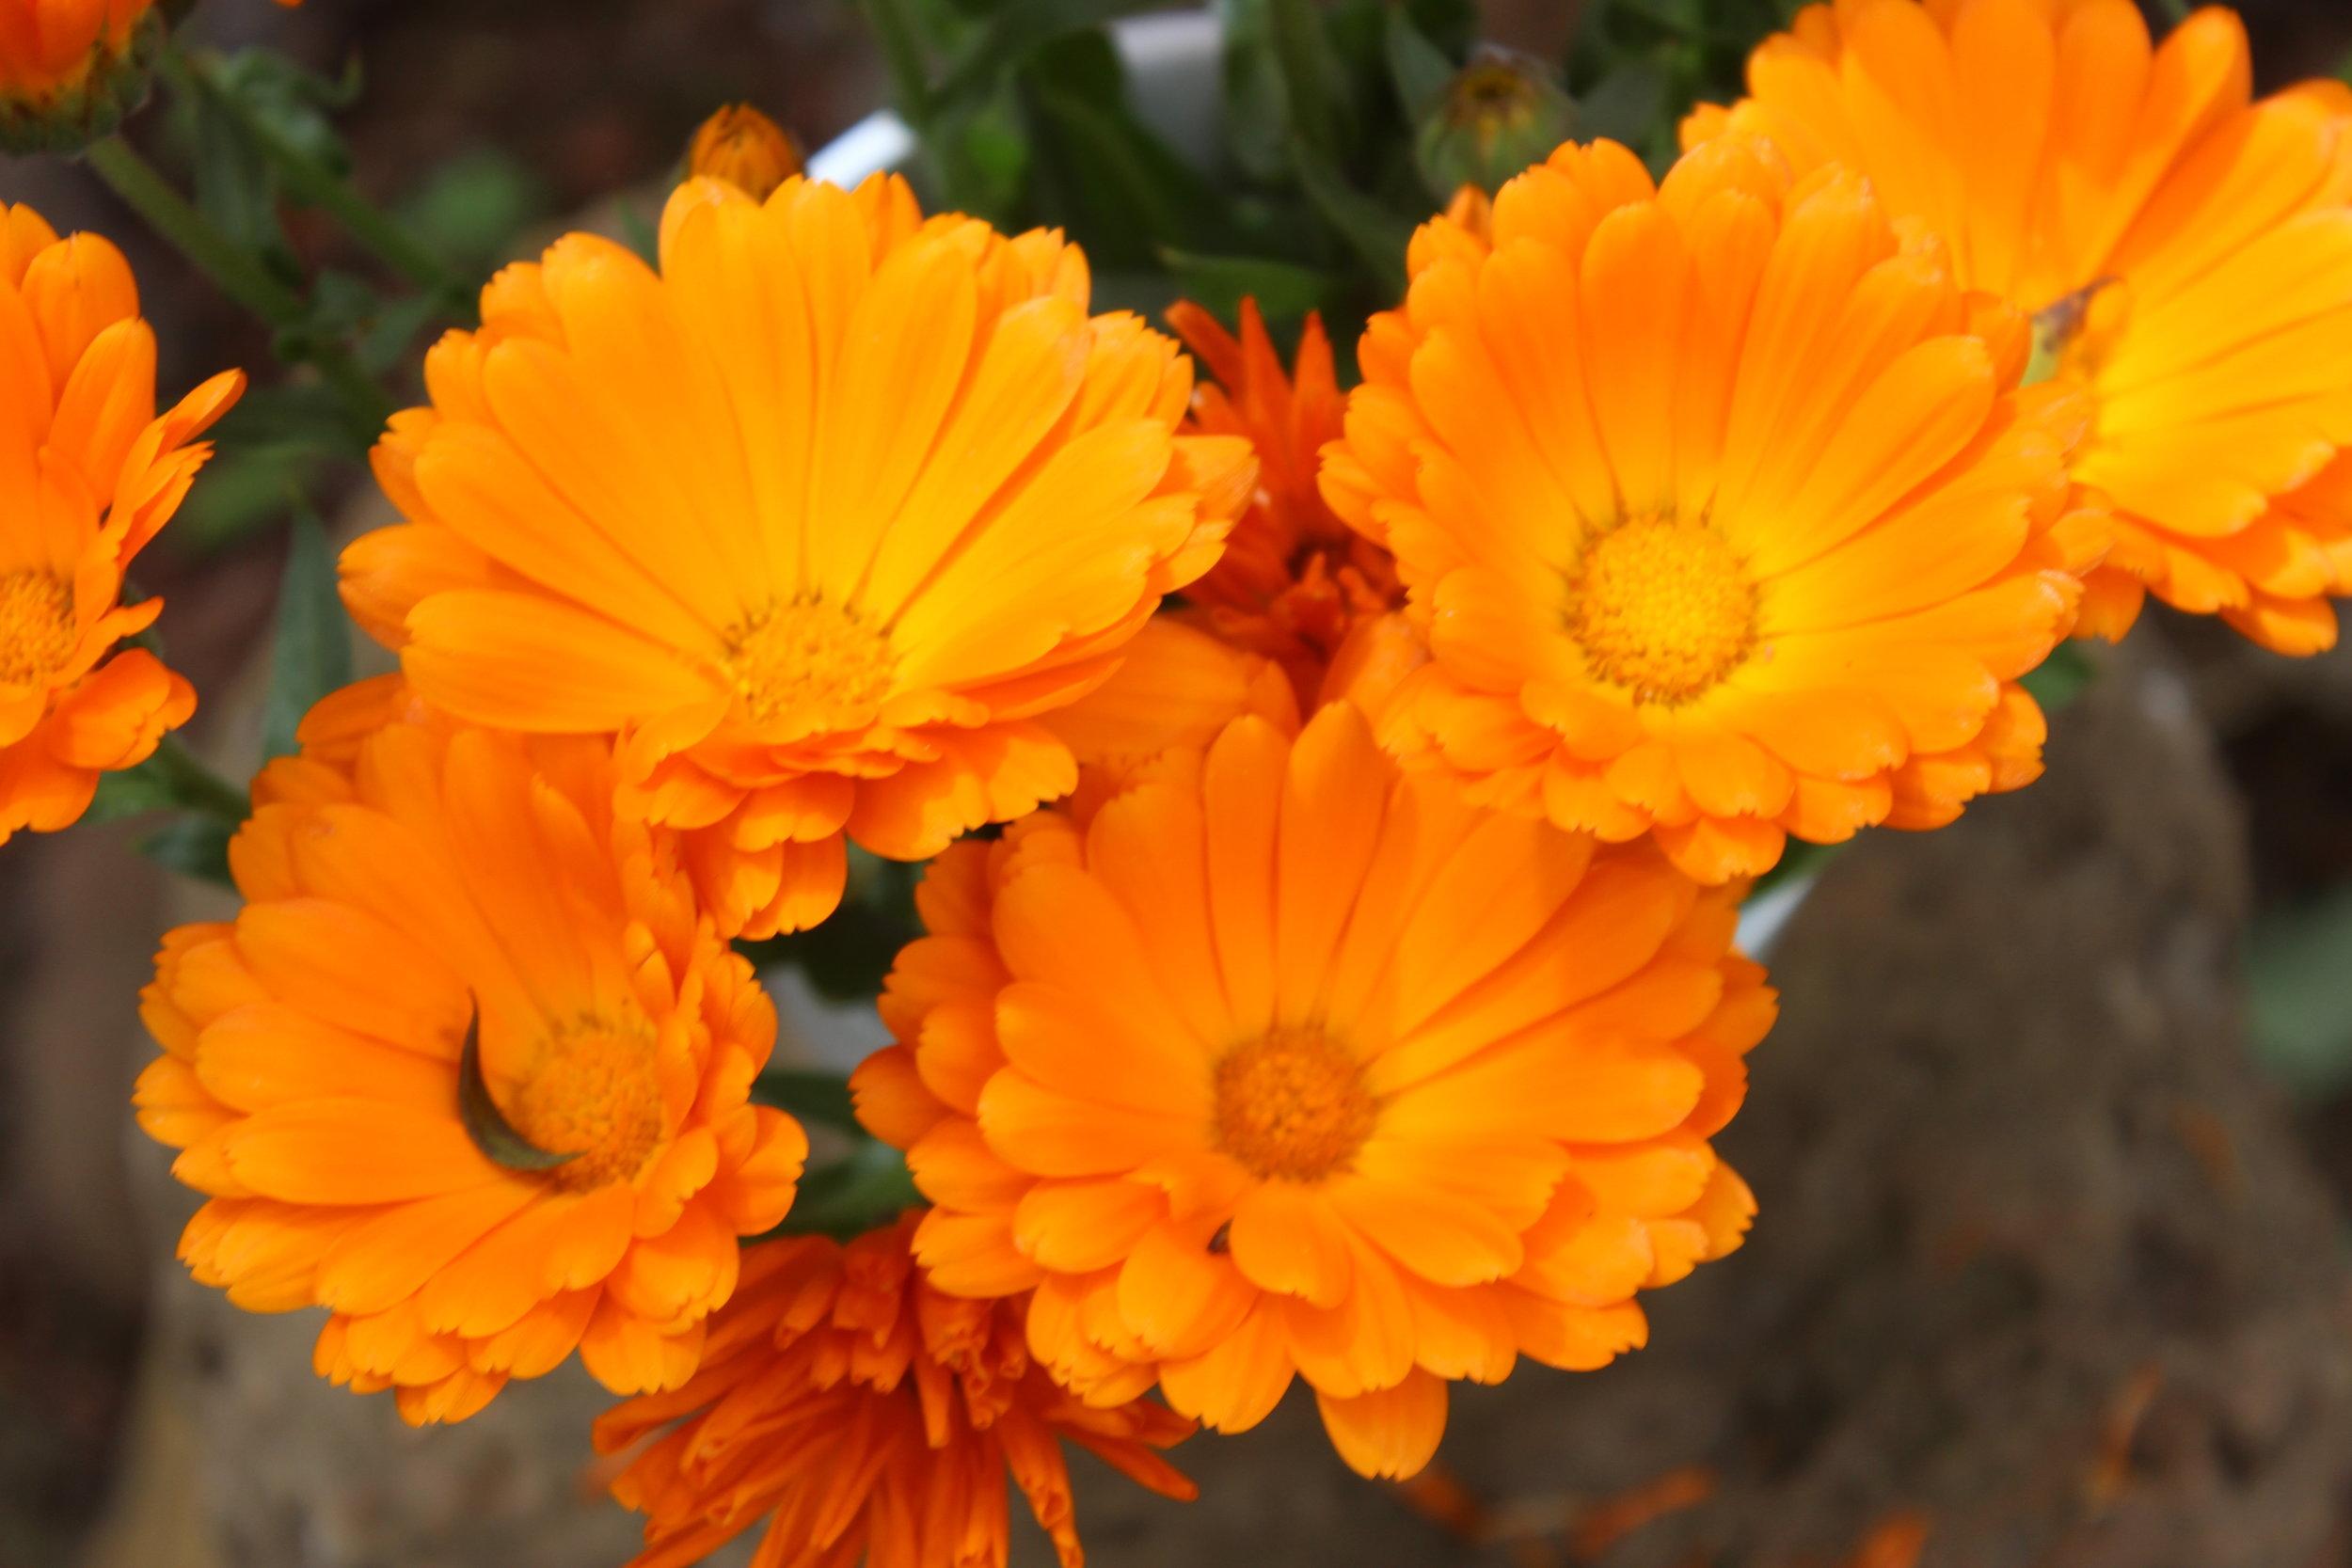 Calendula officinalis (Marigold) Closeup of orange flowers in bloom